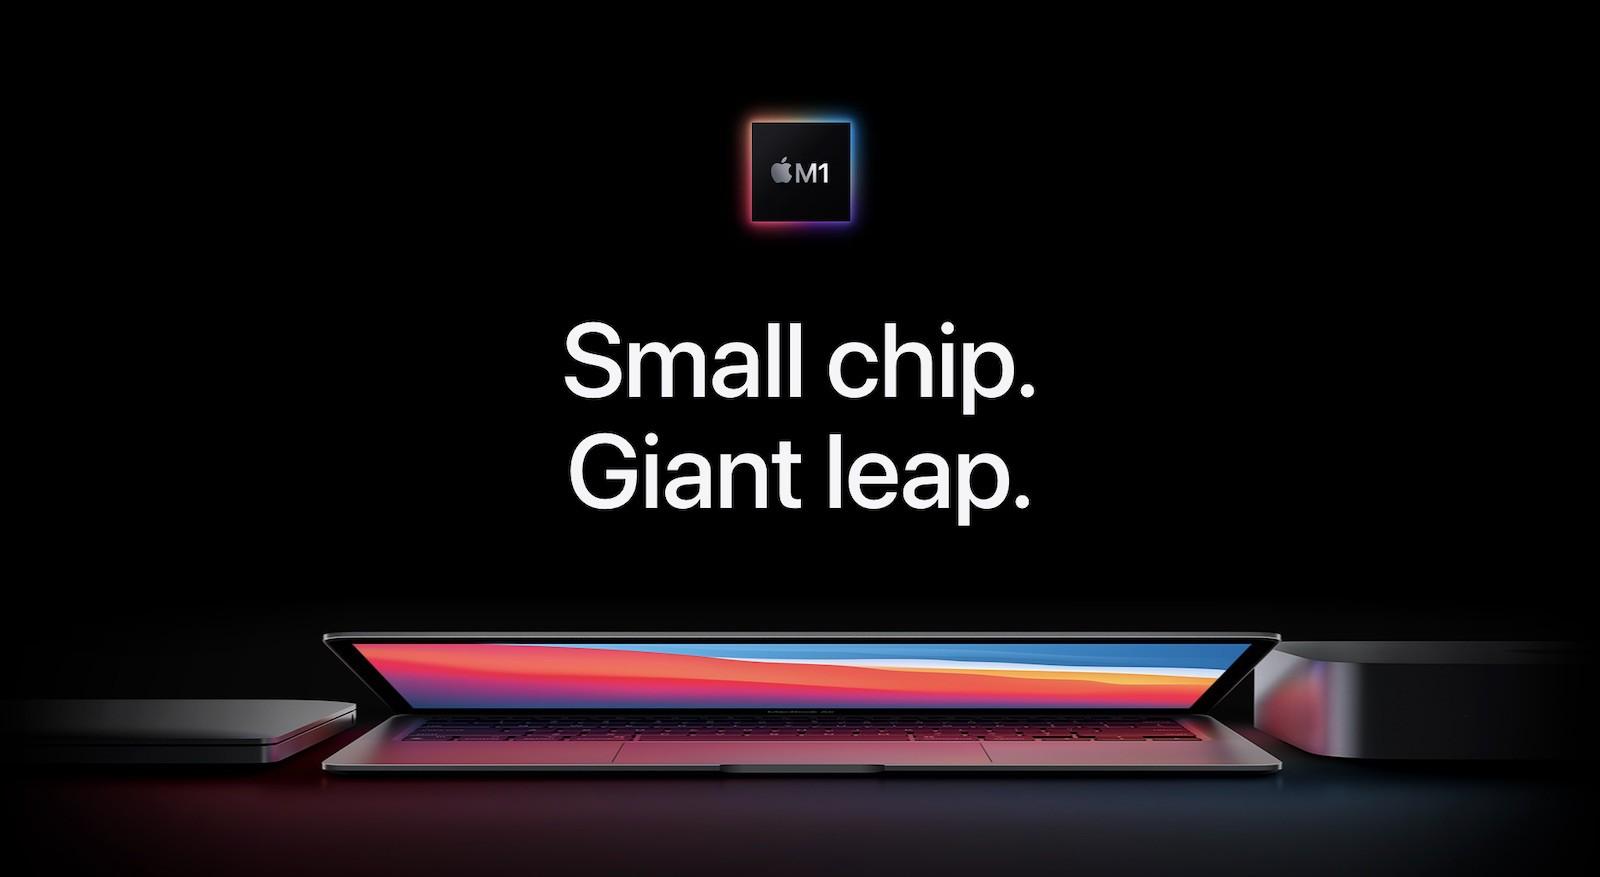 M1 chip MacBooks